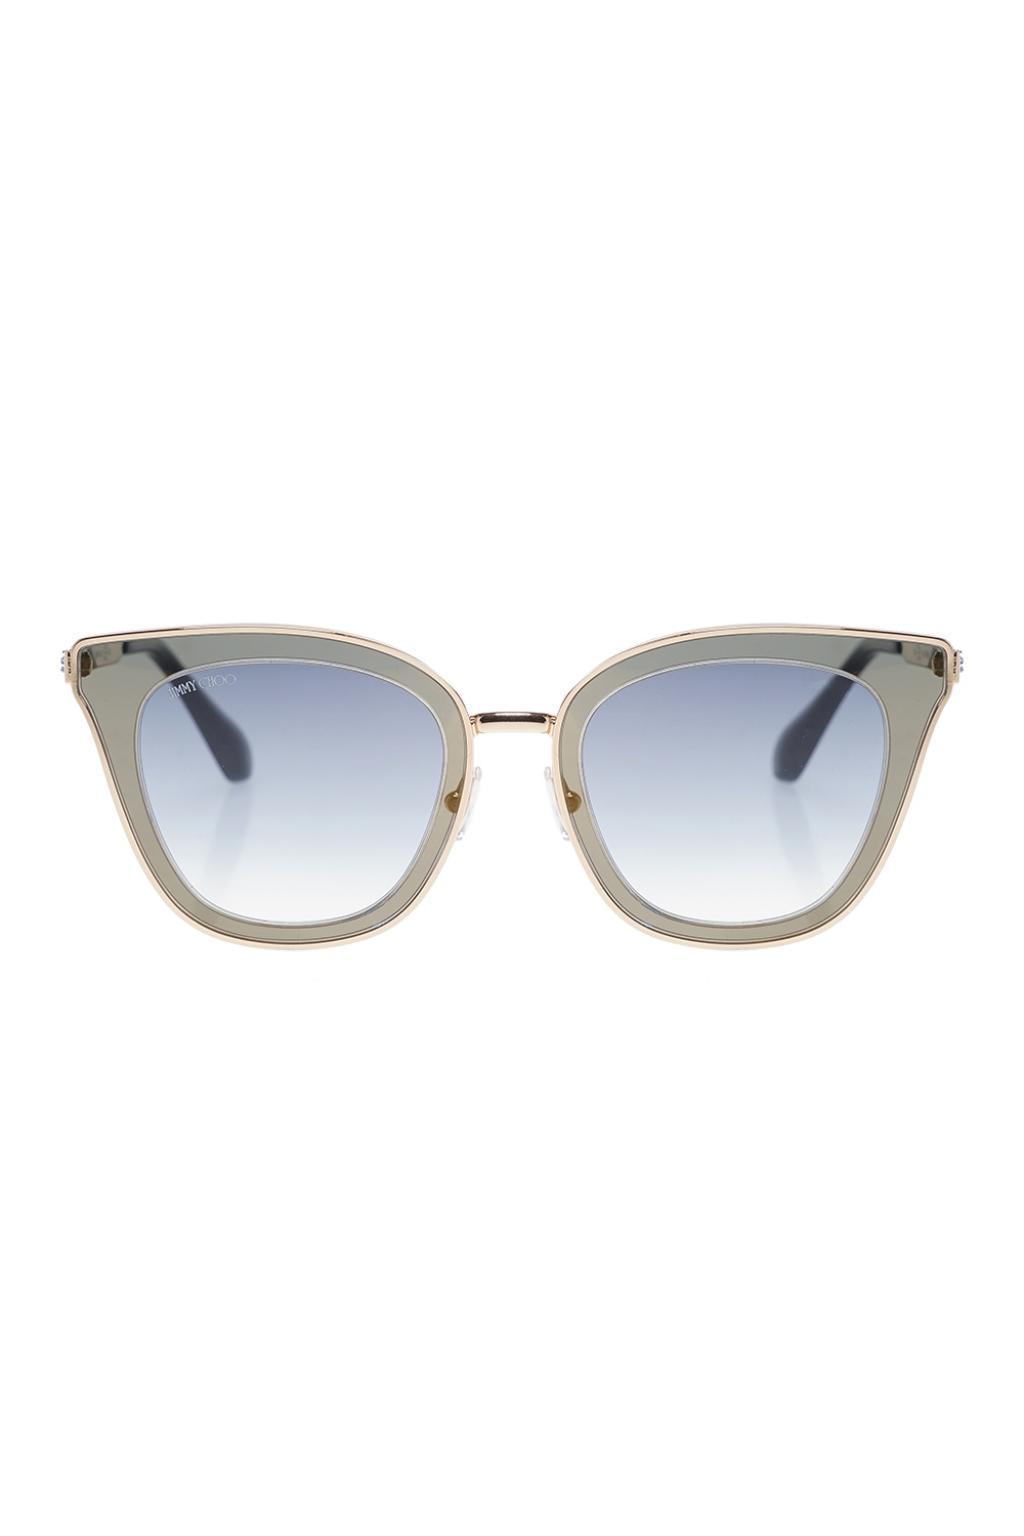 c702e11af78 Lyst - Jimmy Choo  lory  Sunglasses in Metallic